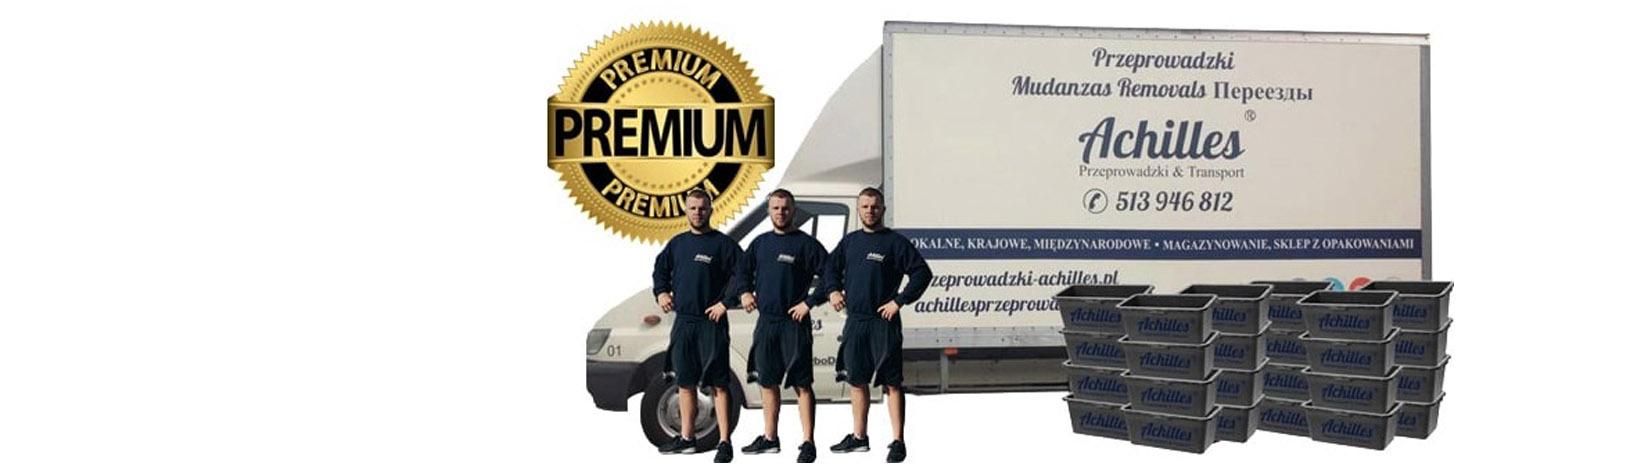 usługi transportowe premium